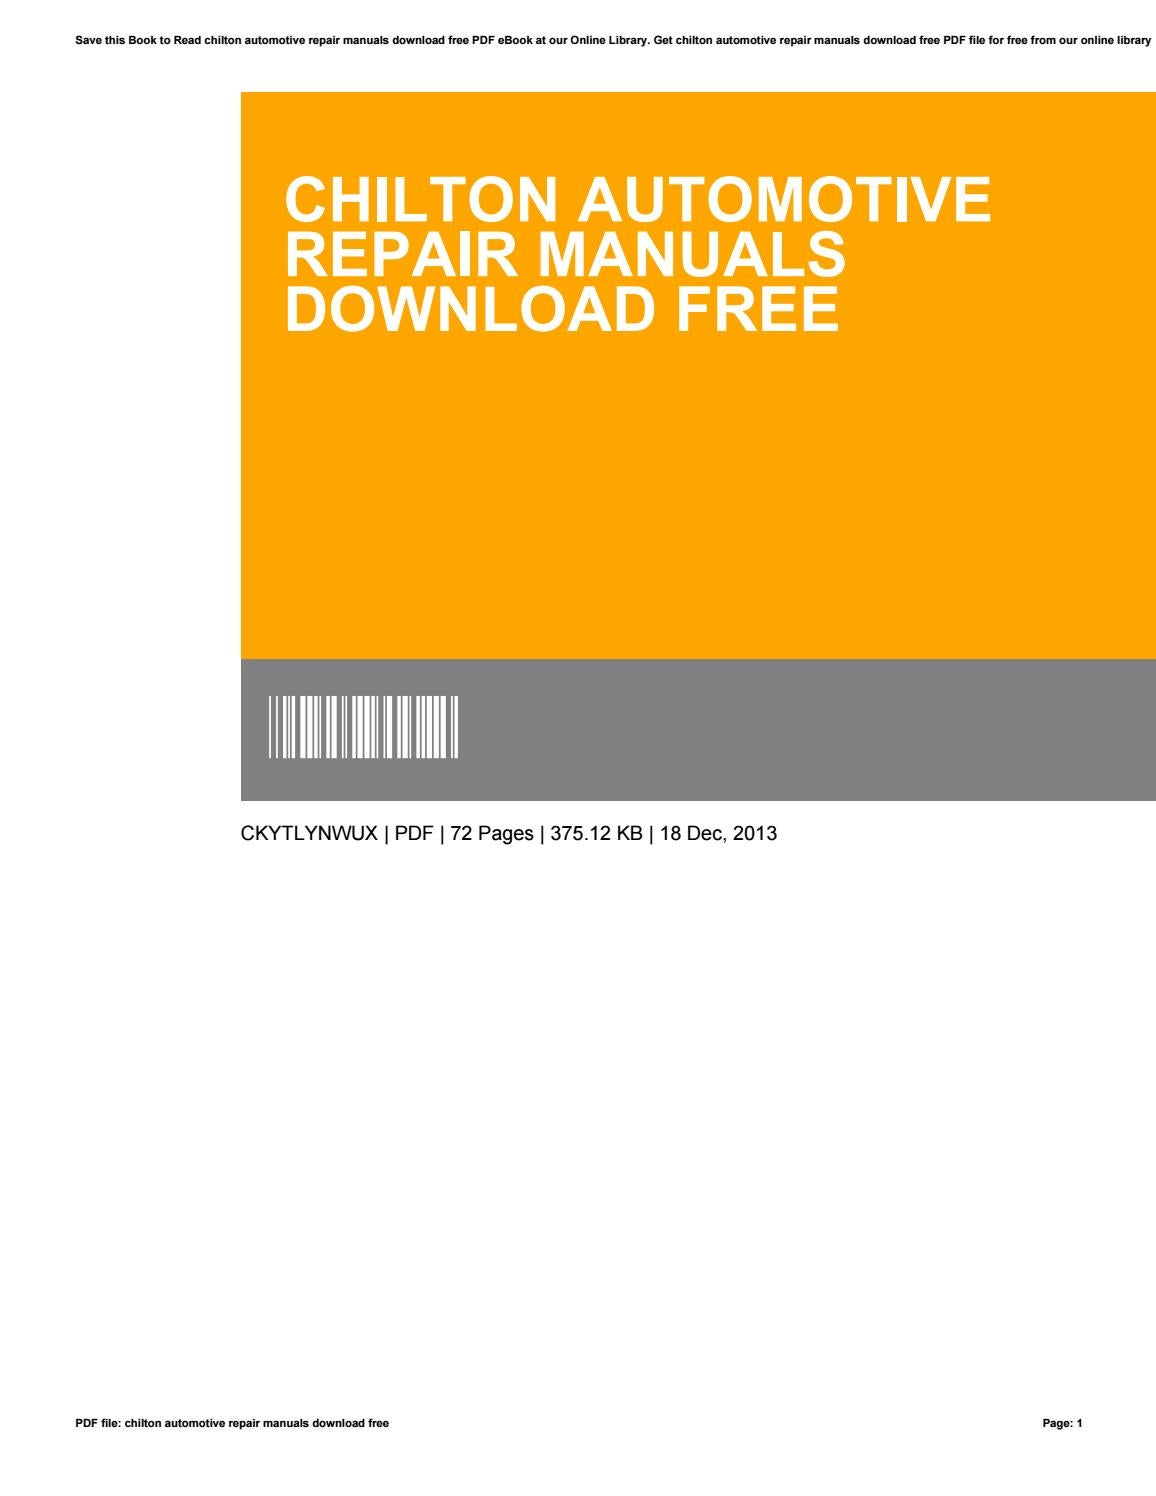 Chilton automotive repair manuals download free by sapta21agustina - issuu